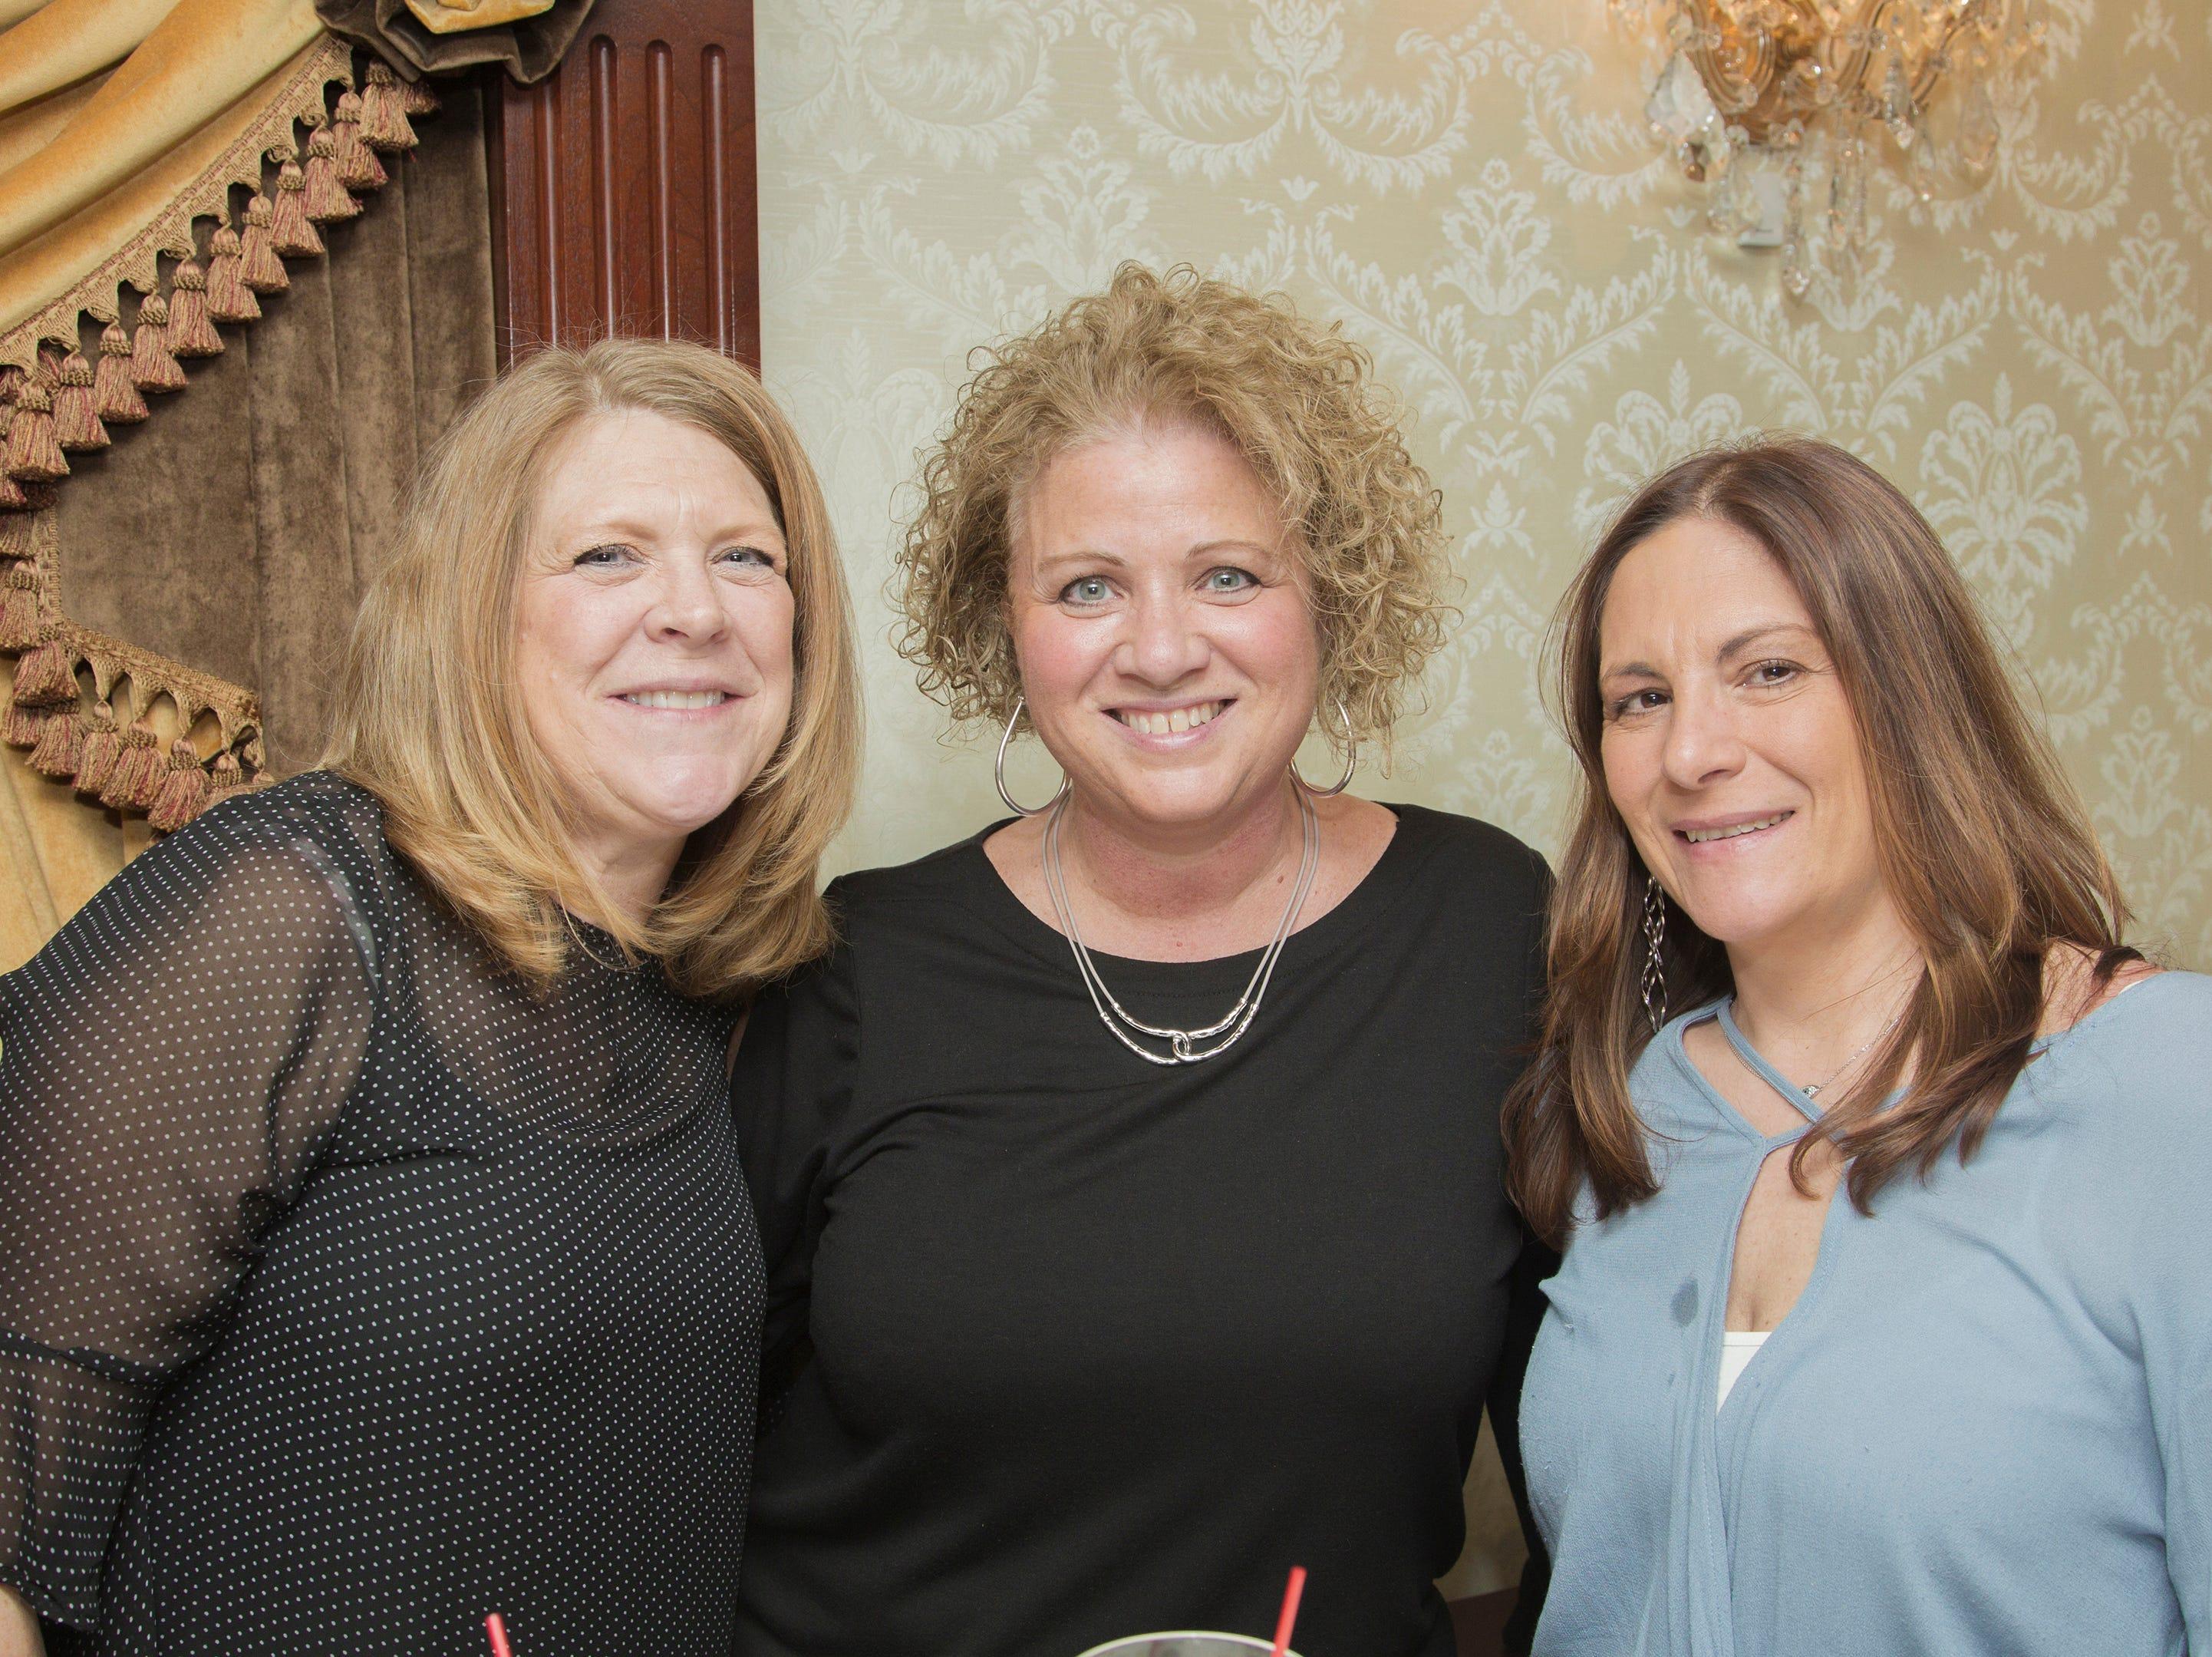 Barbara Moran, Loretta Schatz, Desiree Orsino. Waldwick High School held its Project Graduation Fashion Show at Macaluso's in Hawthorne. 03/13/2019